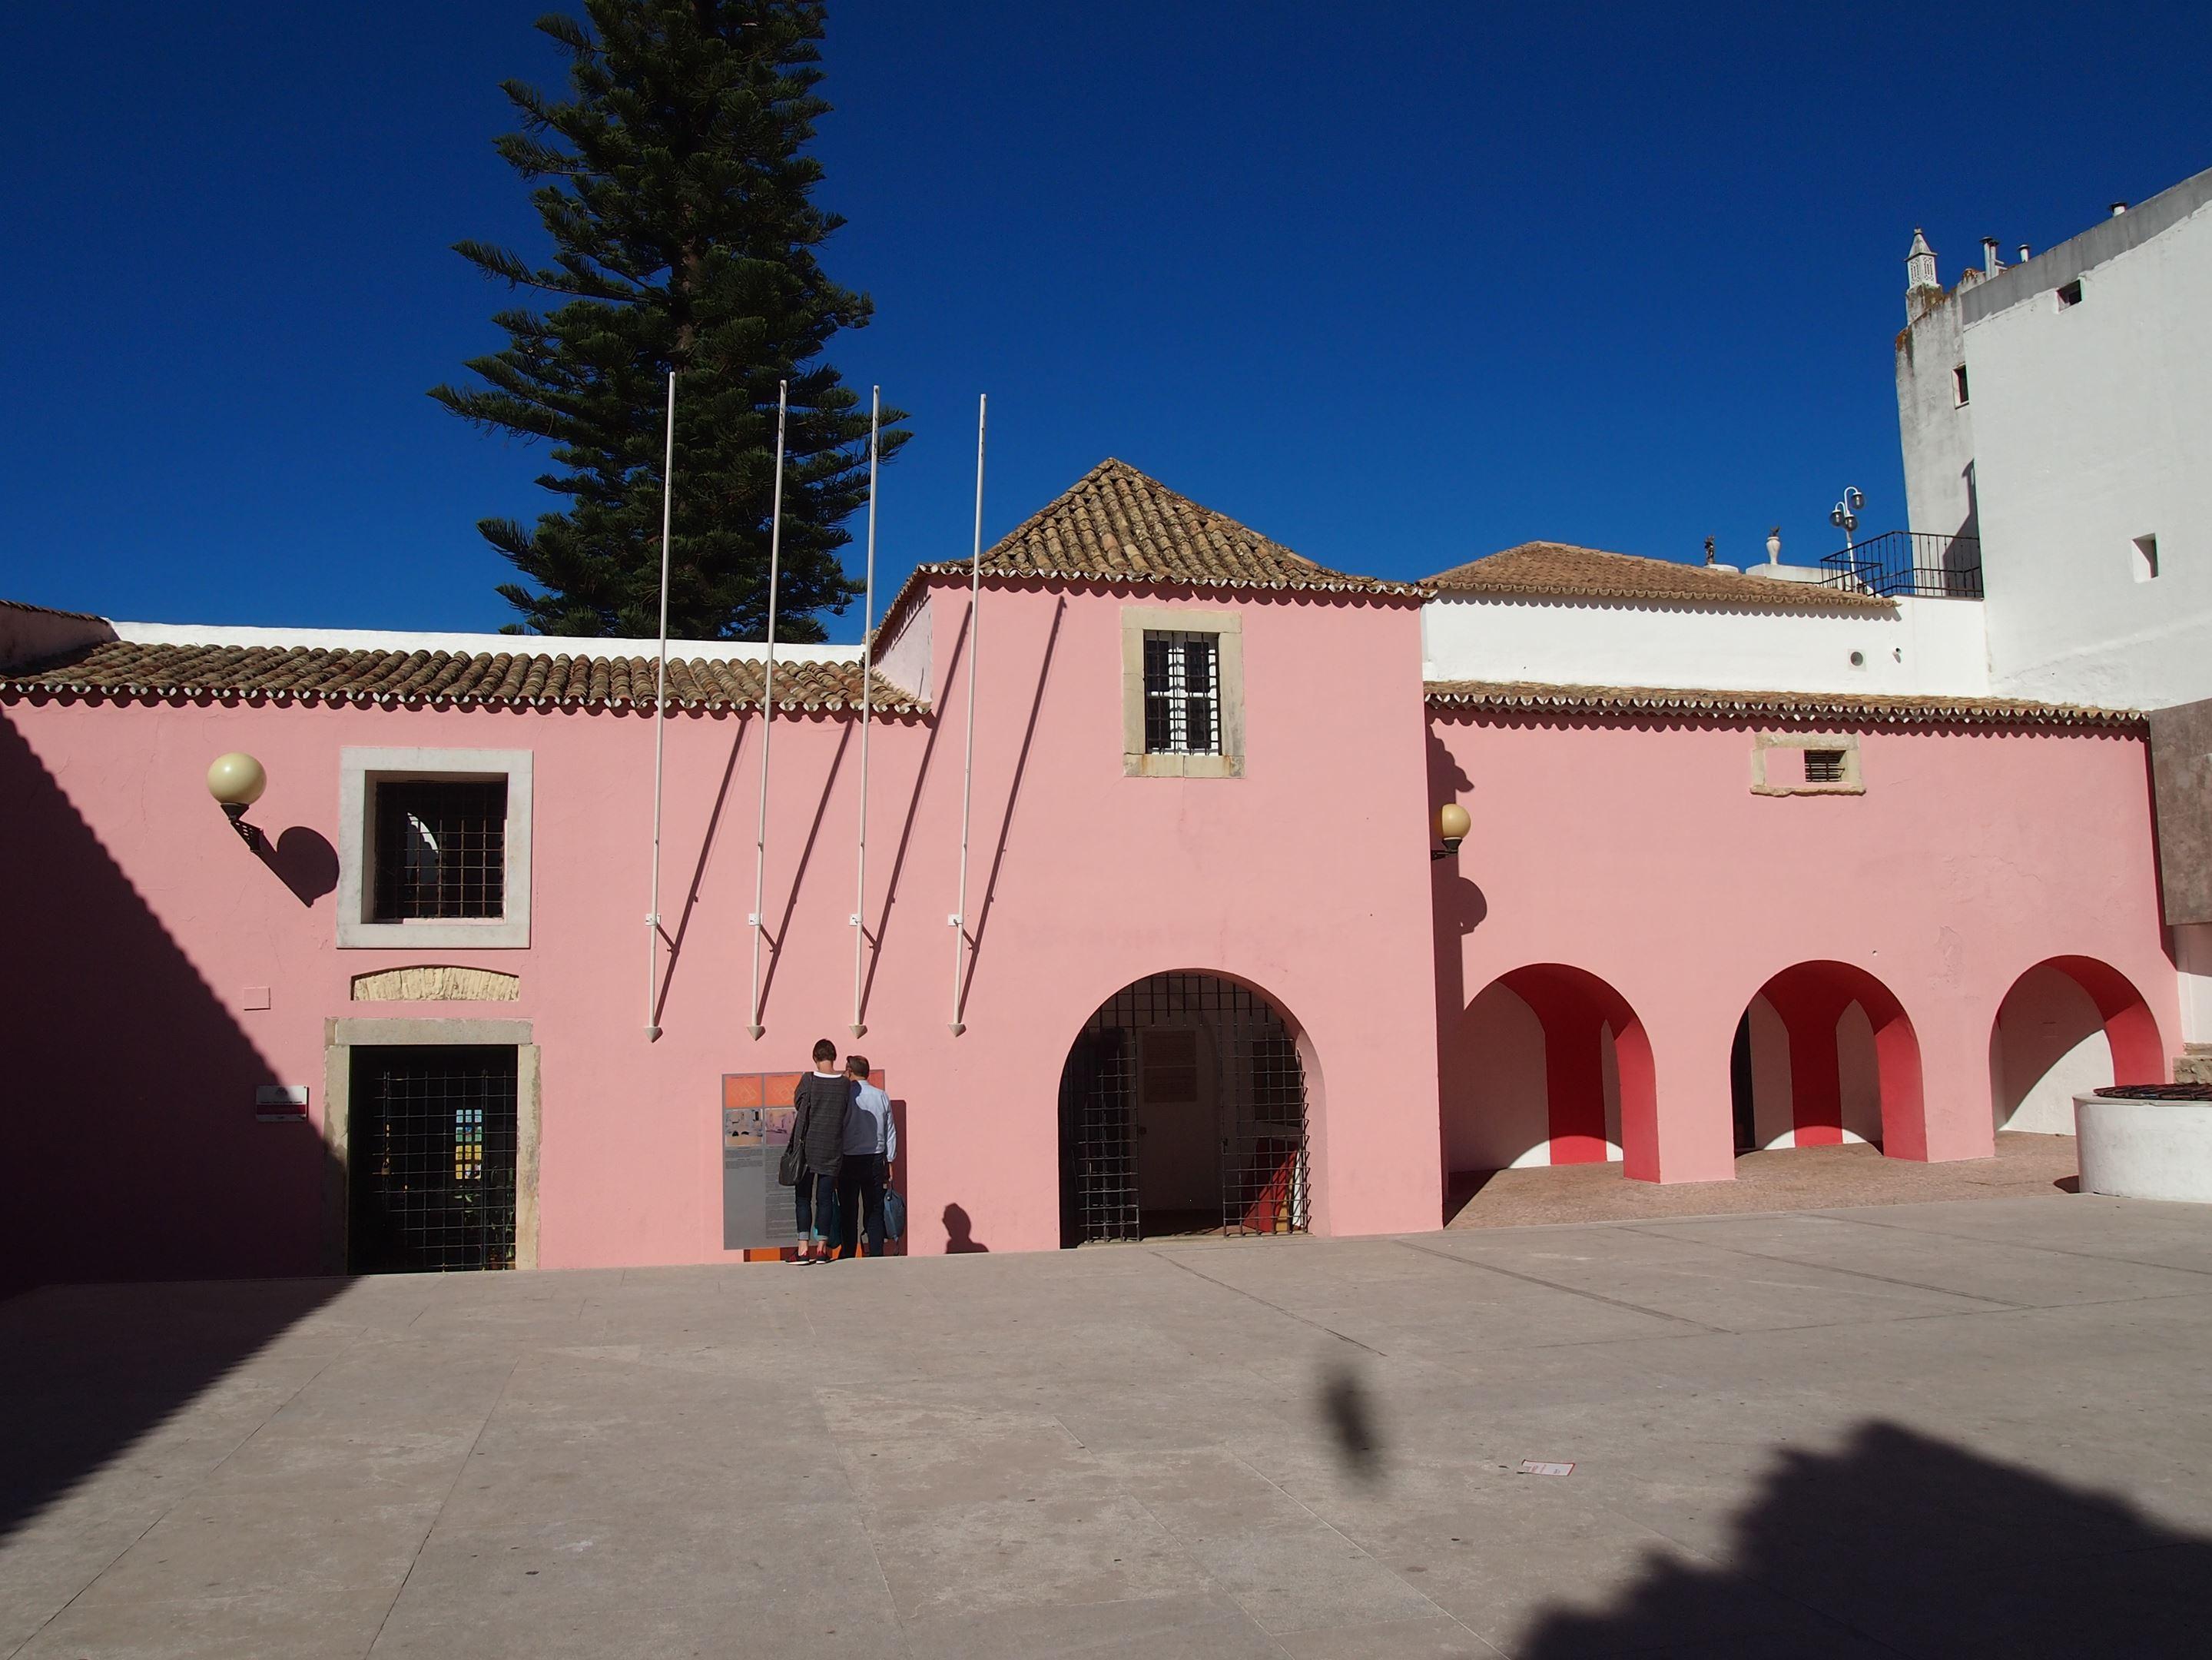 Convento Espirito Santo, Loulé, Algarve